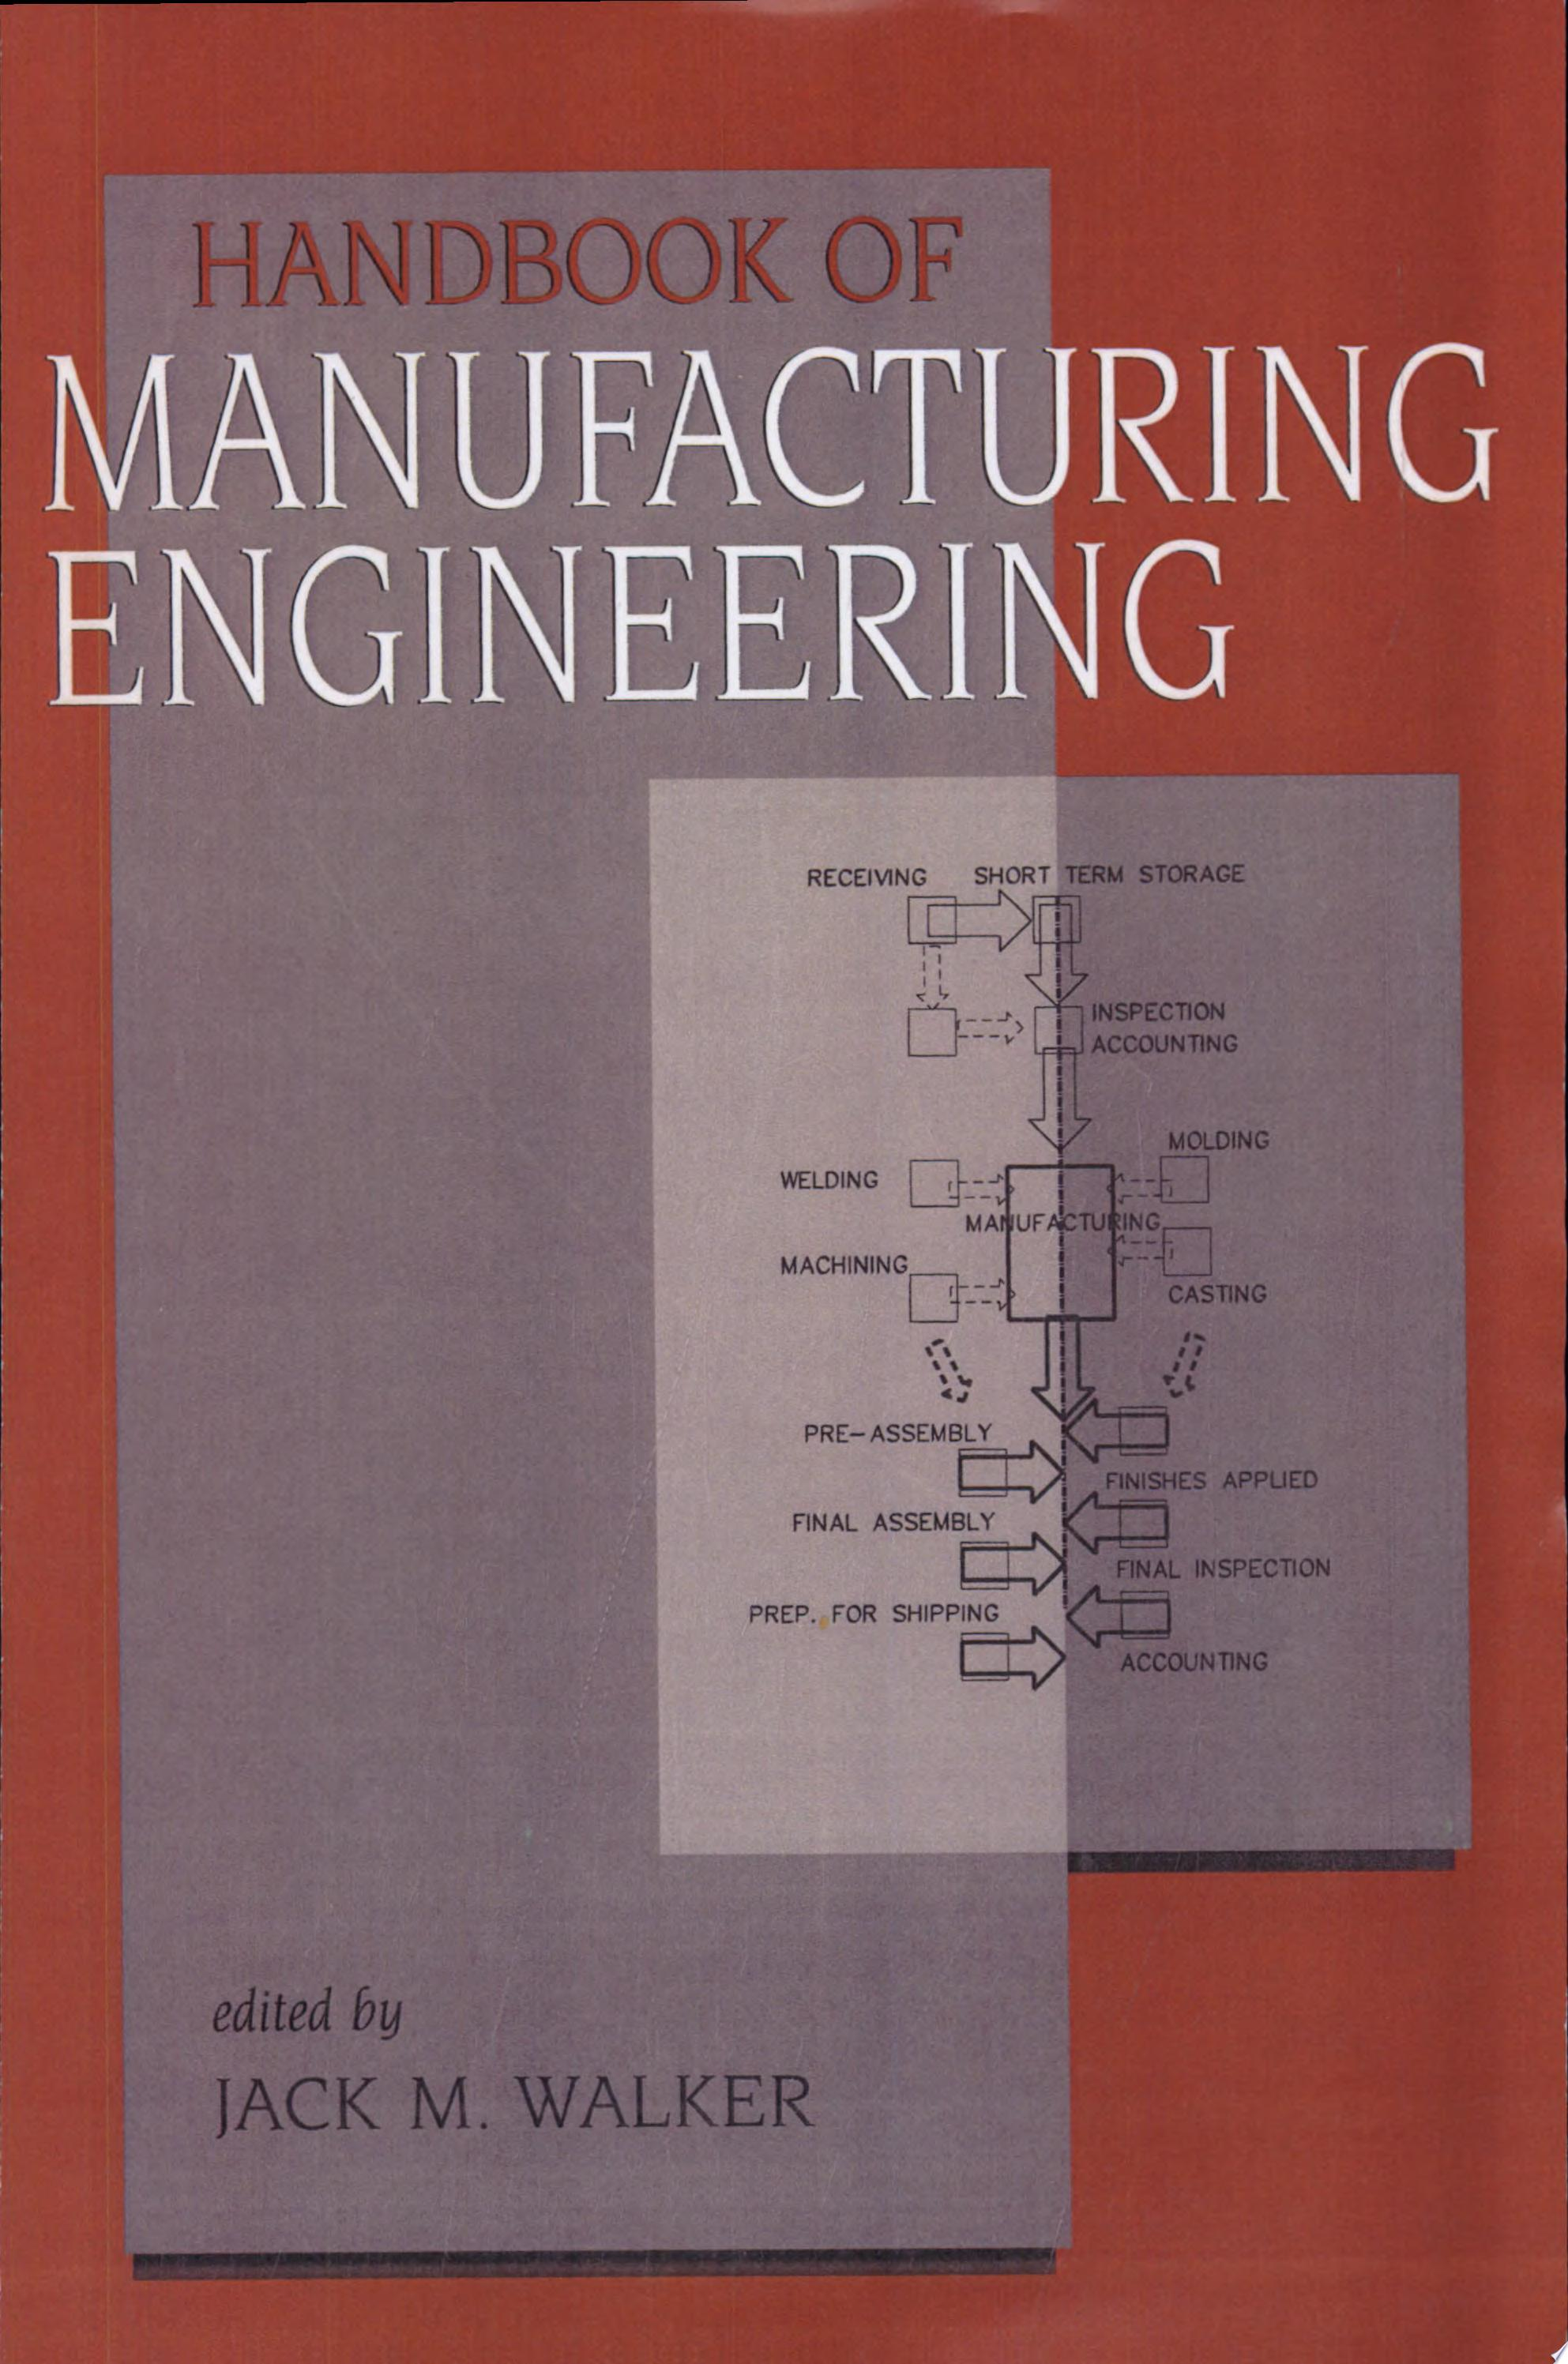 Handbook of Manufacturing Engineering  Second Edition   4 Volume Set